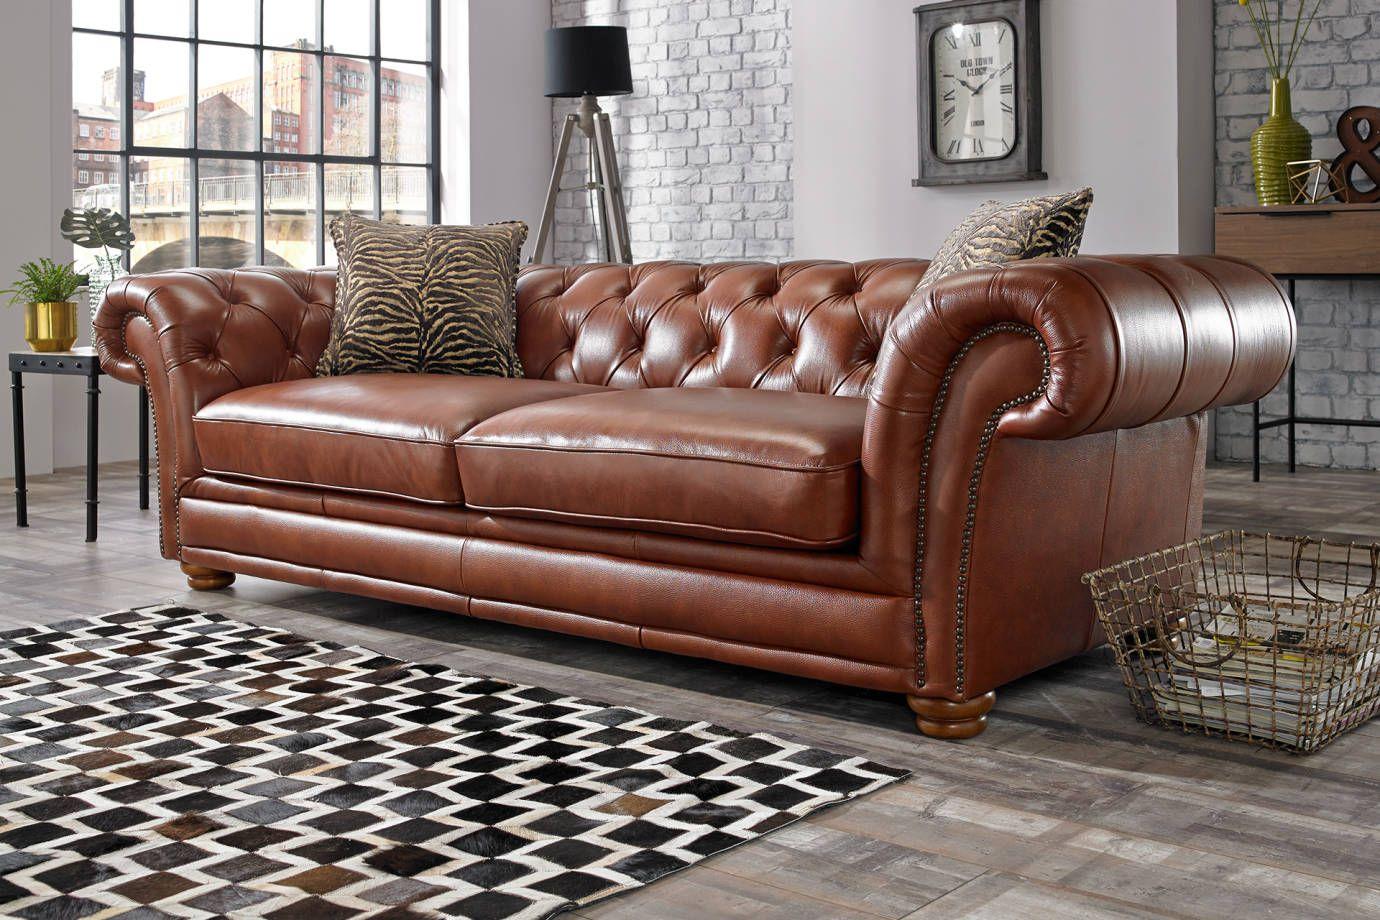 Stamford Sofology The Female Carpenter Sofa Chair Furniture